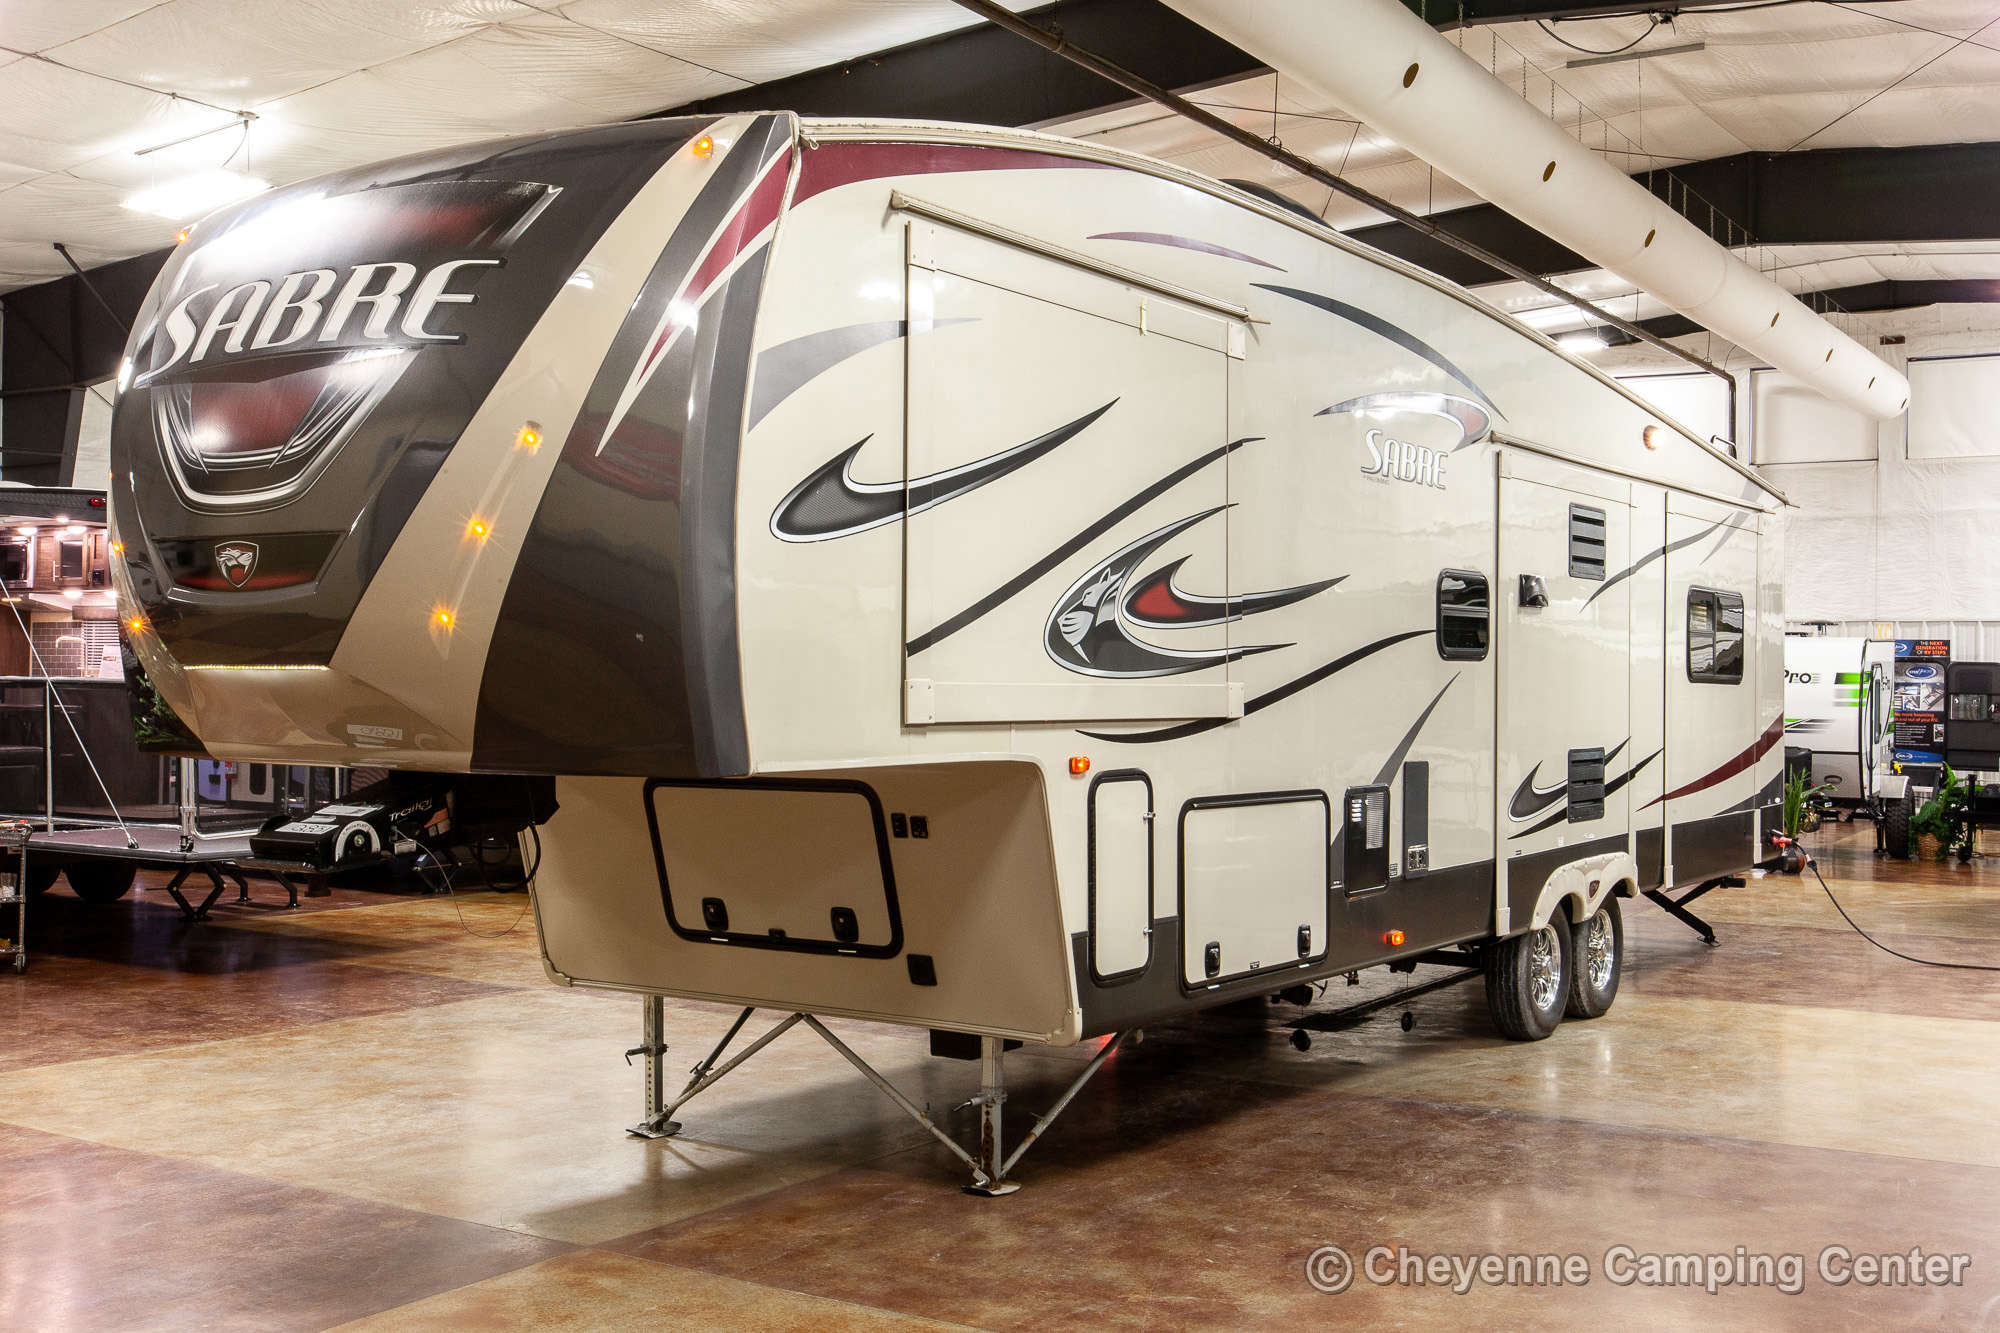 2015 Forest River Sabre 34RLQS-6 Fifth Wheel Exterior Image